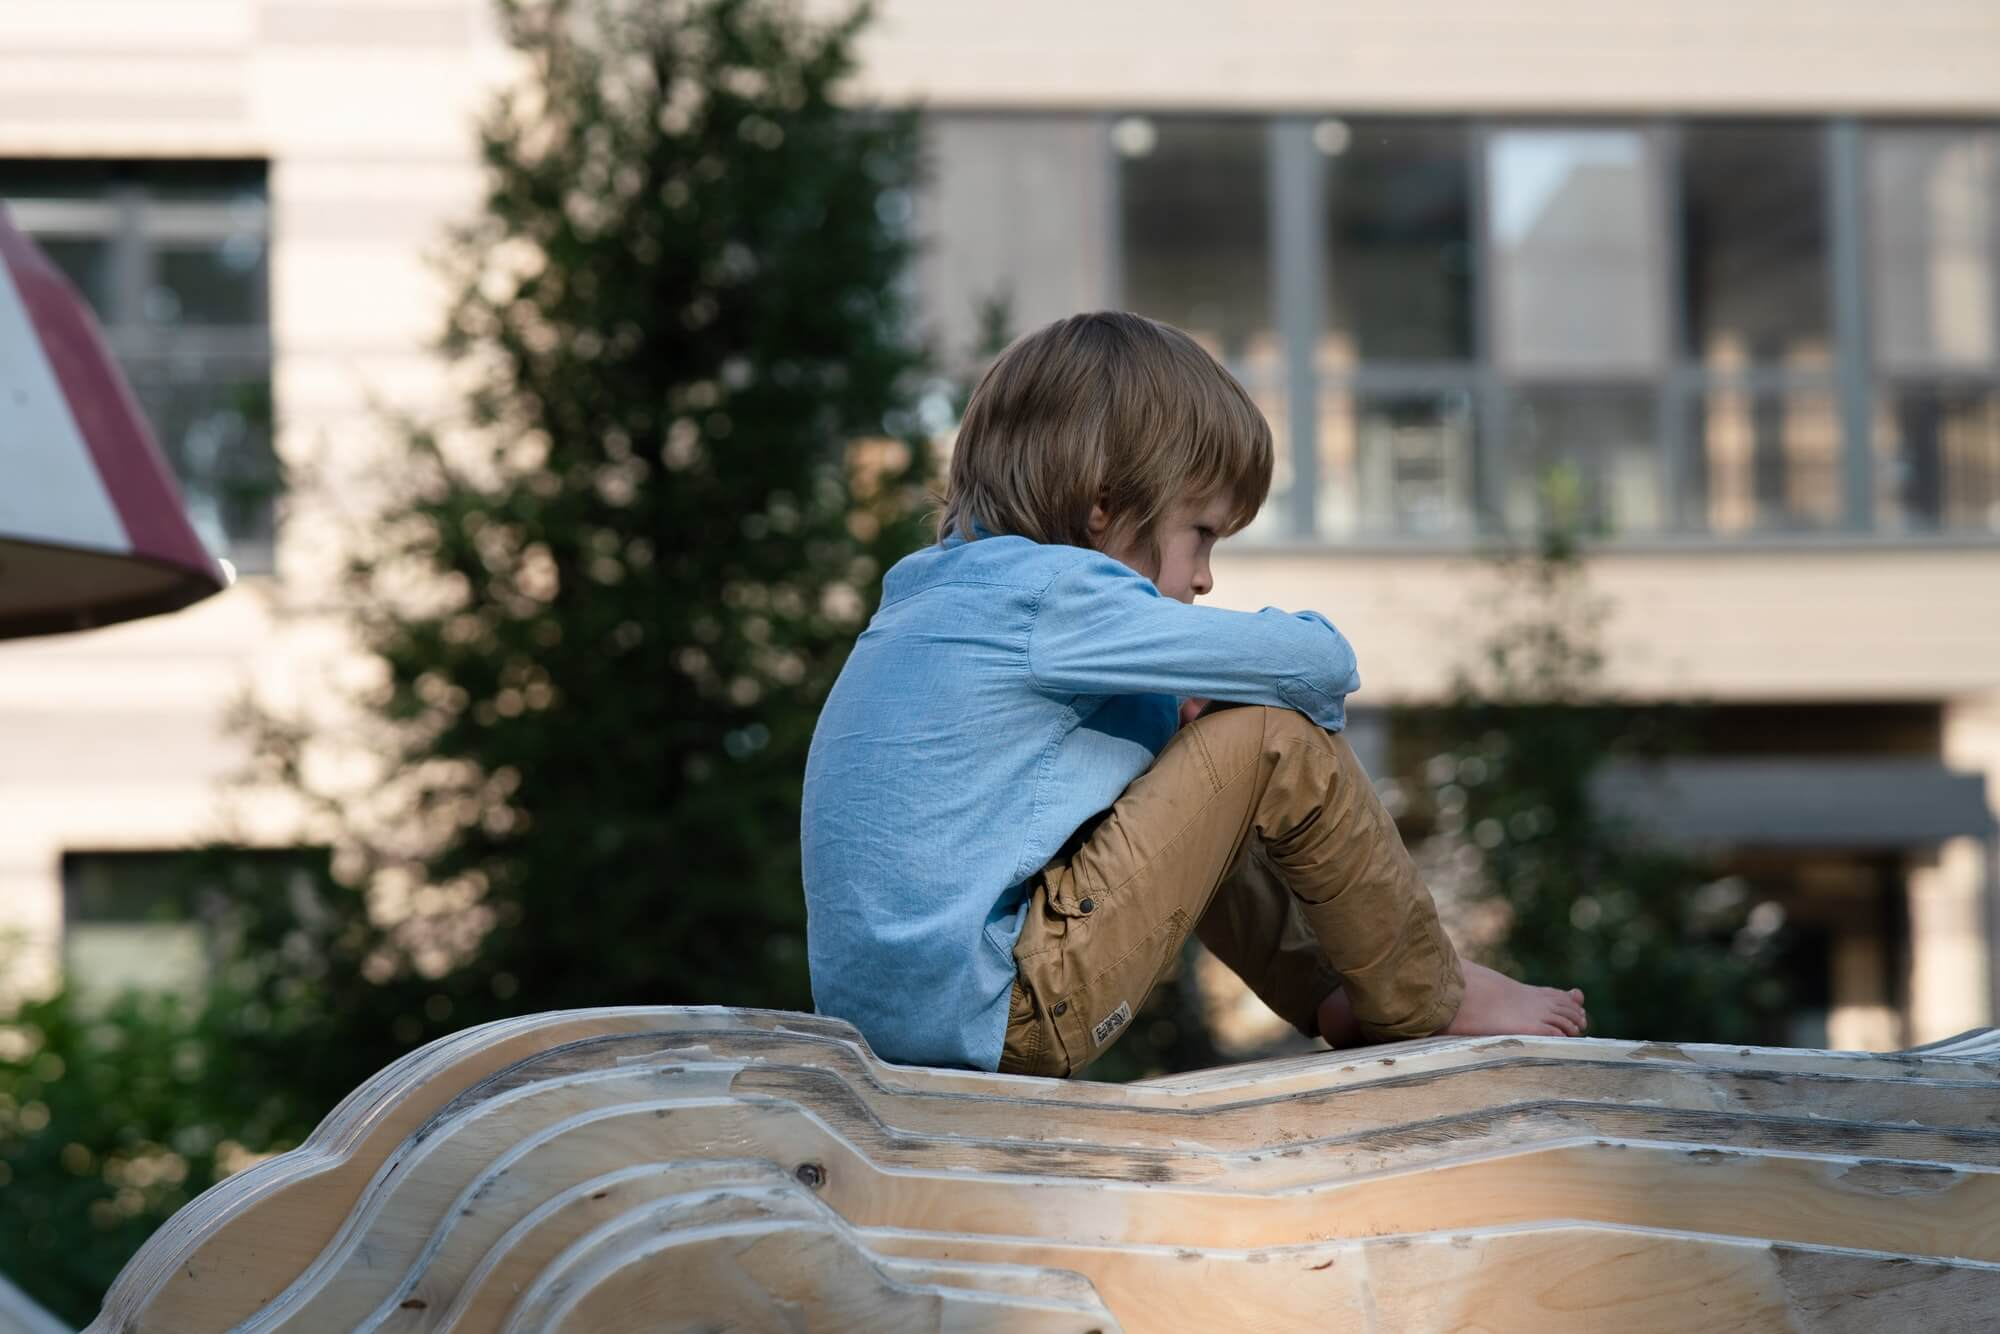 Sad angry boy on the Playground. Punished, divorce